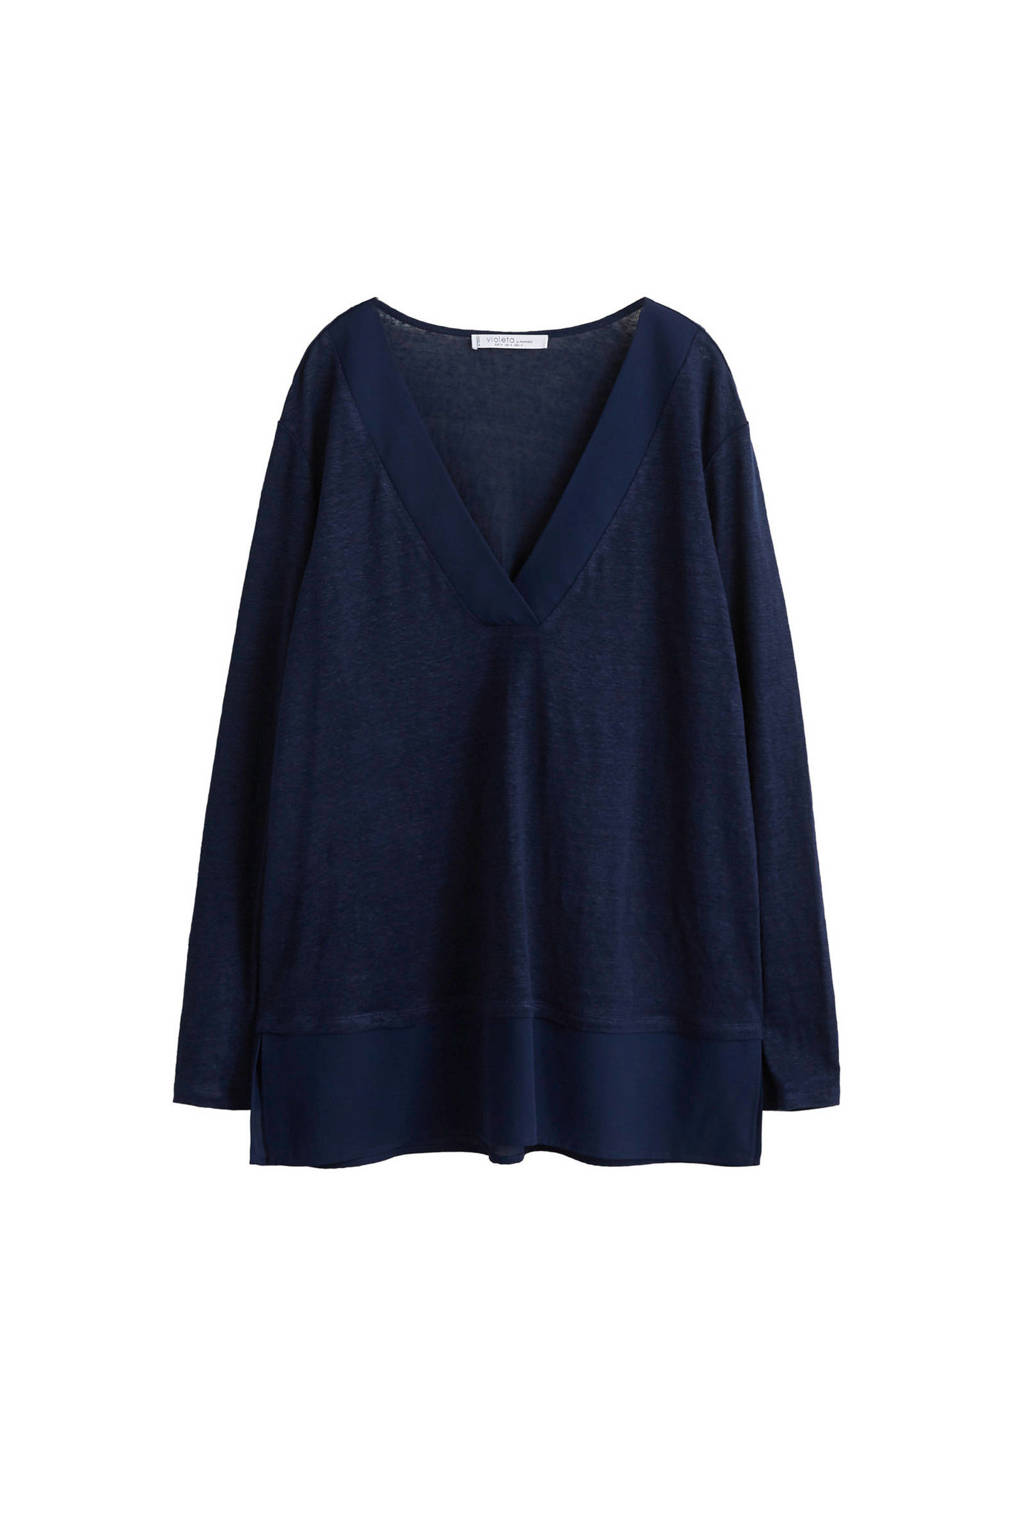 Violeta by Mango trui donkerblauw, Donkerblauw